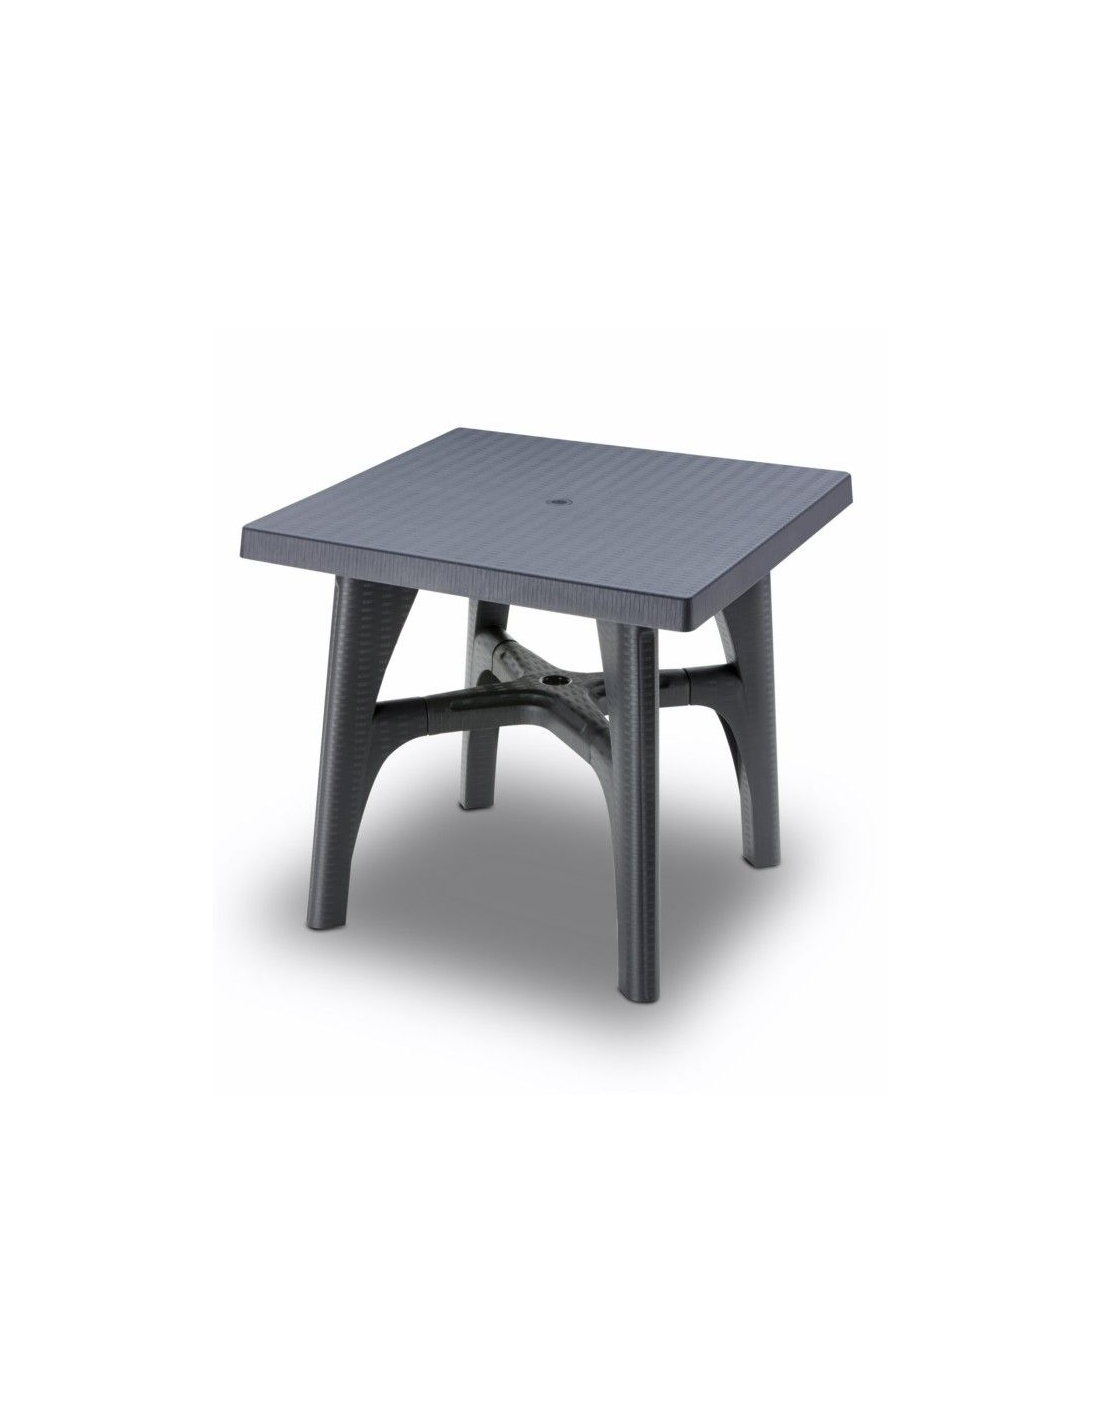 Tavolo esterno per giardino smontabile intrecciato 80x80cm - Tavolo plastica esterno ...